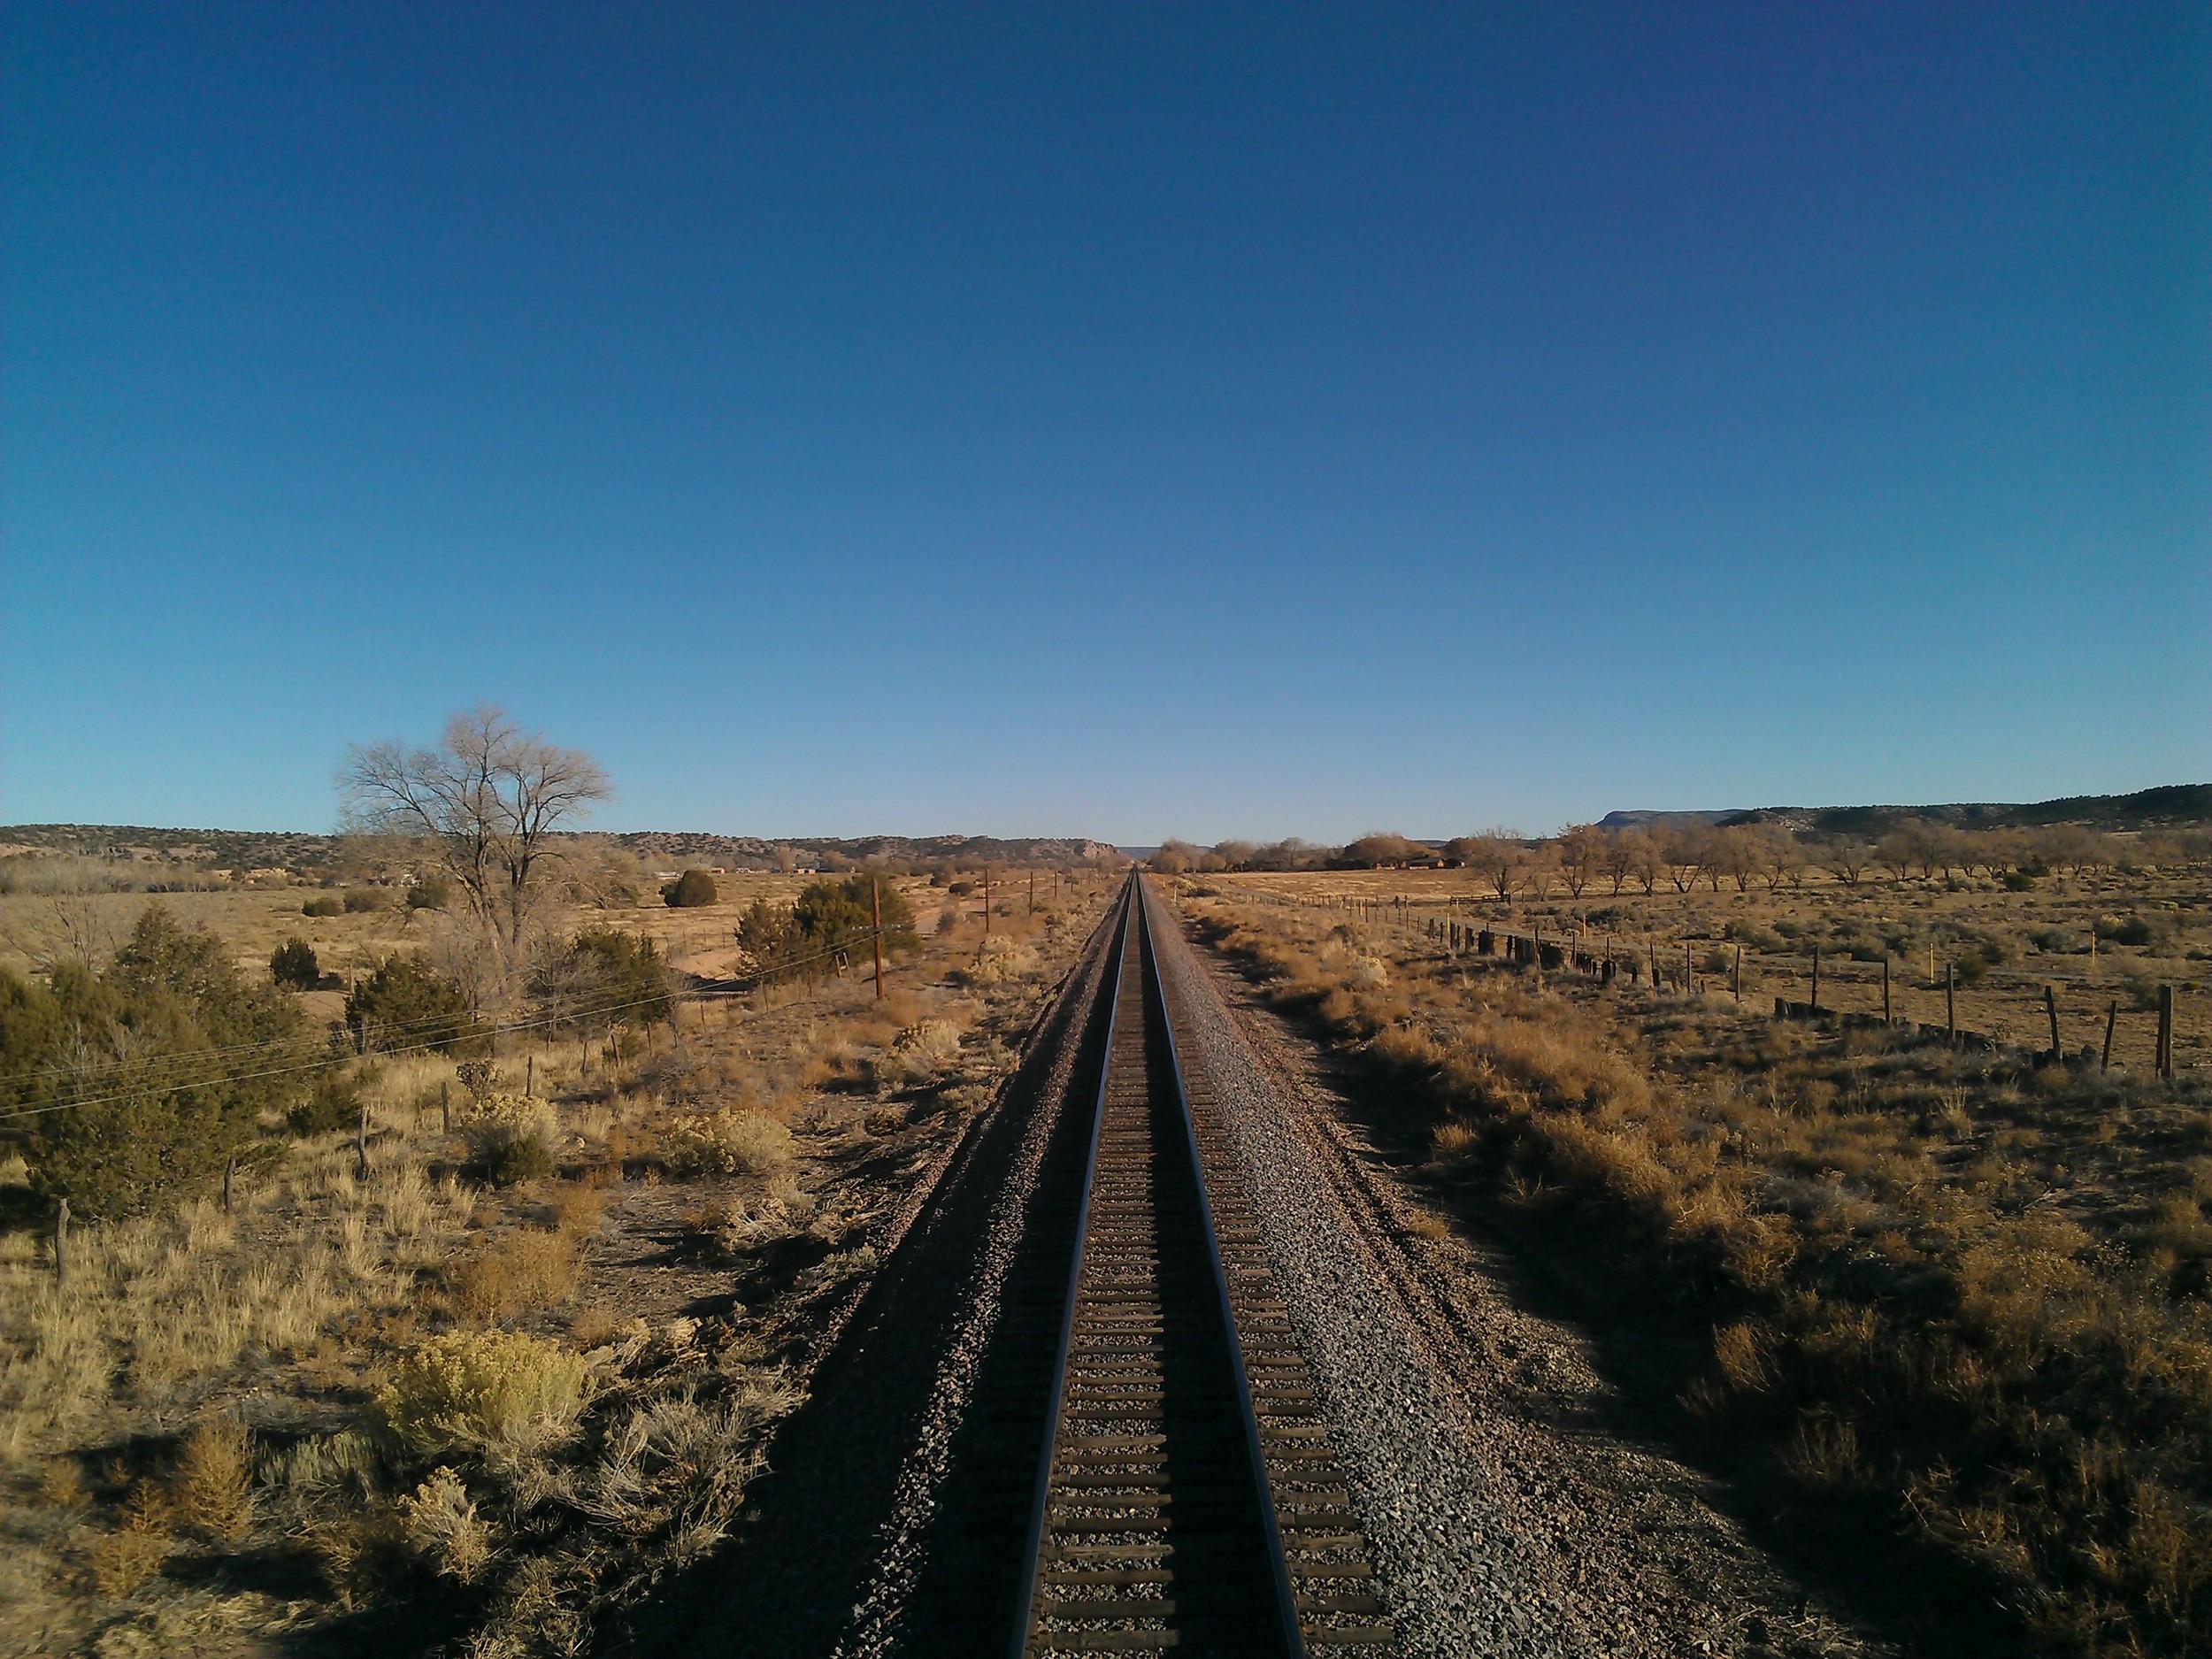 AMTRAK Railroad Line thru New Mexico Landscape